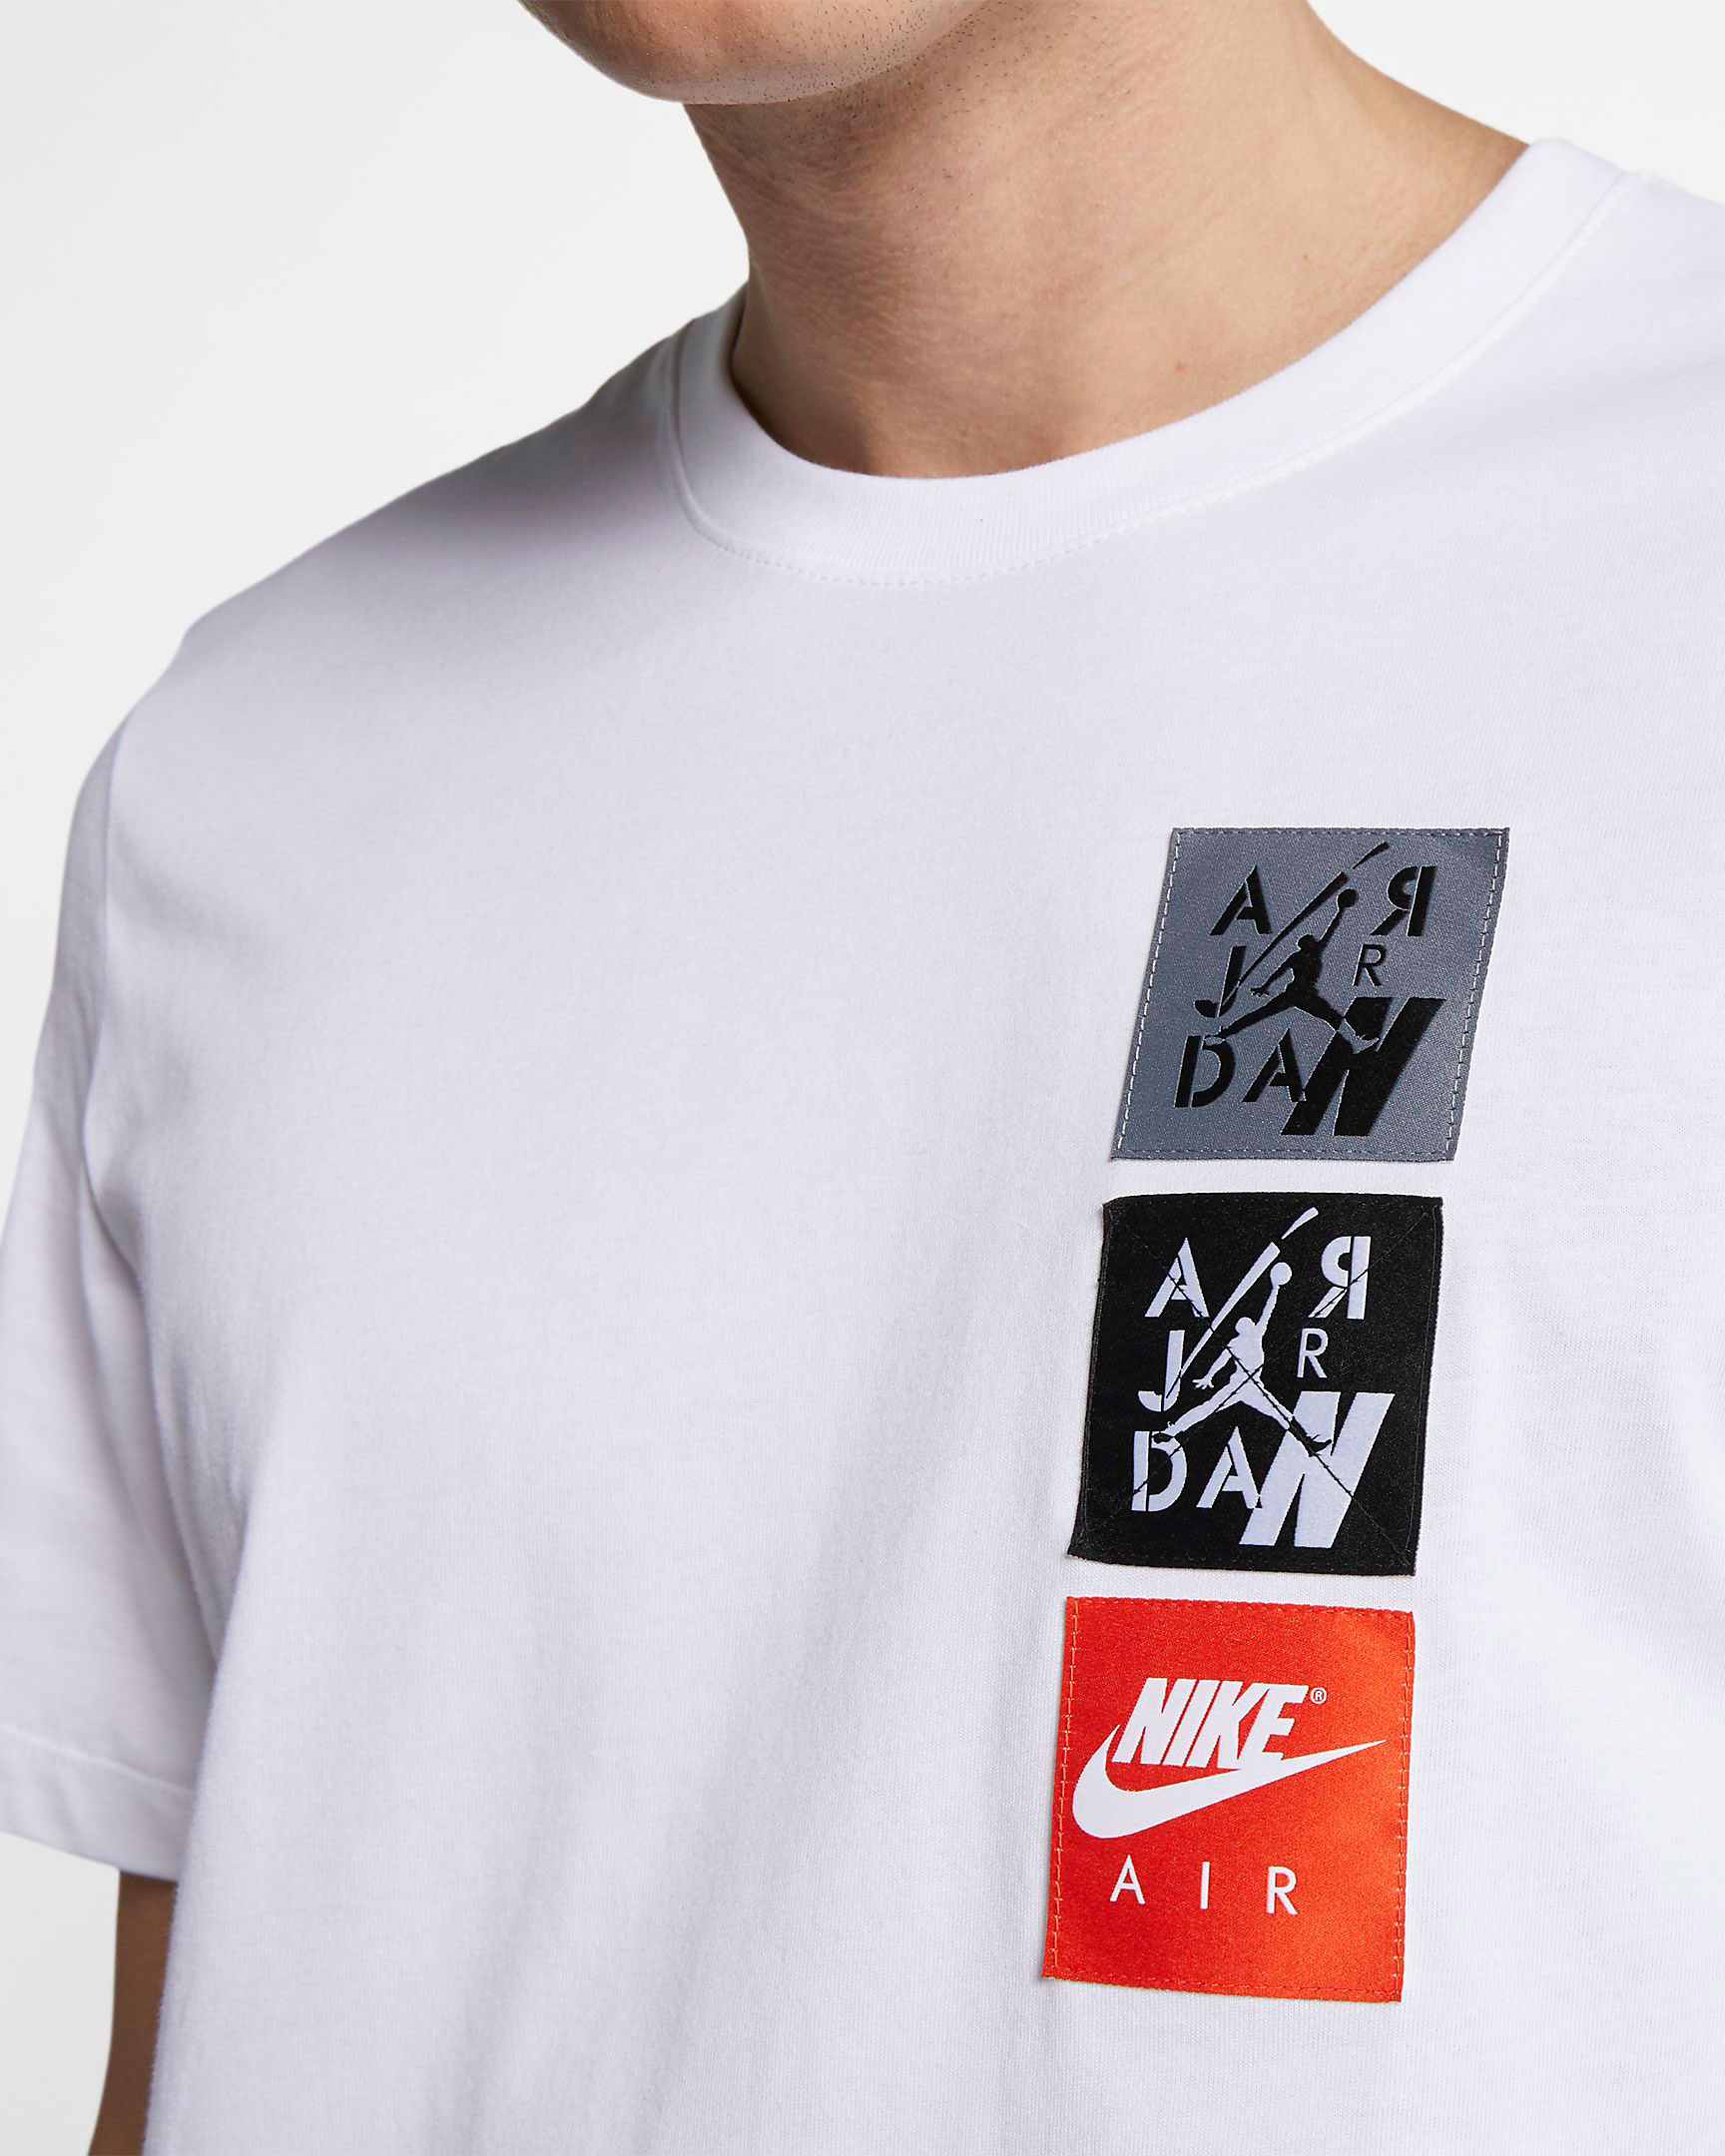 air-jordan-4-bred-2019-nike-air-shirt-3